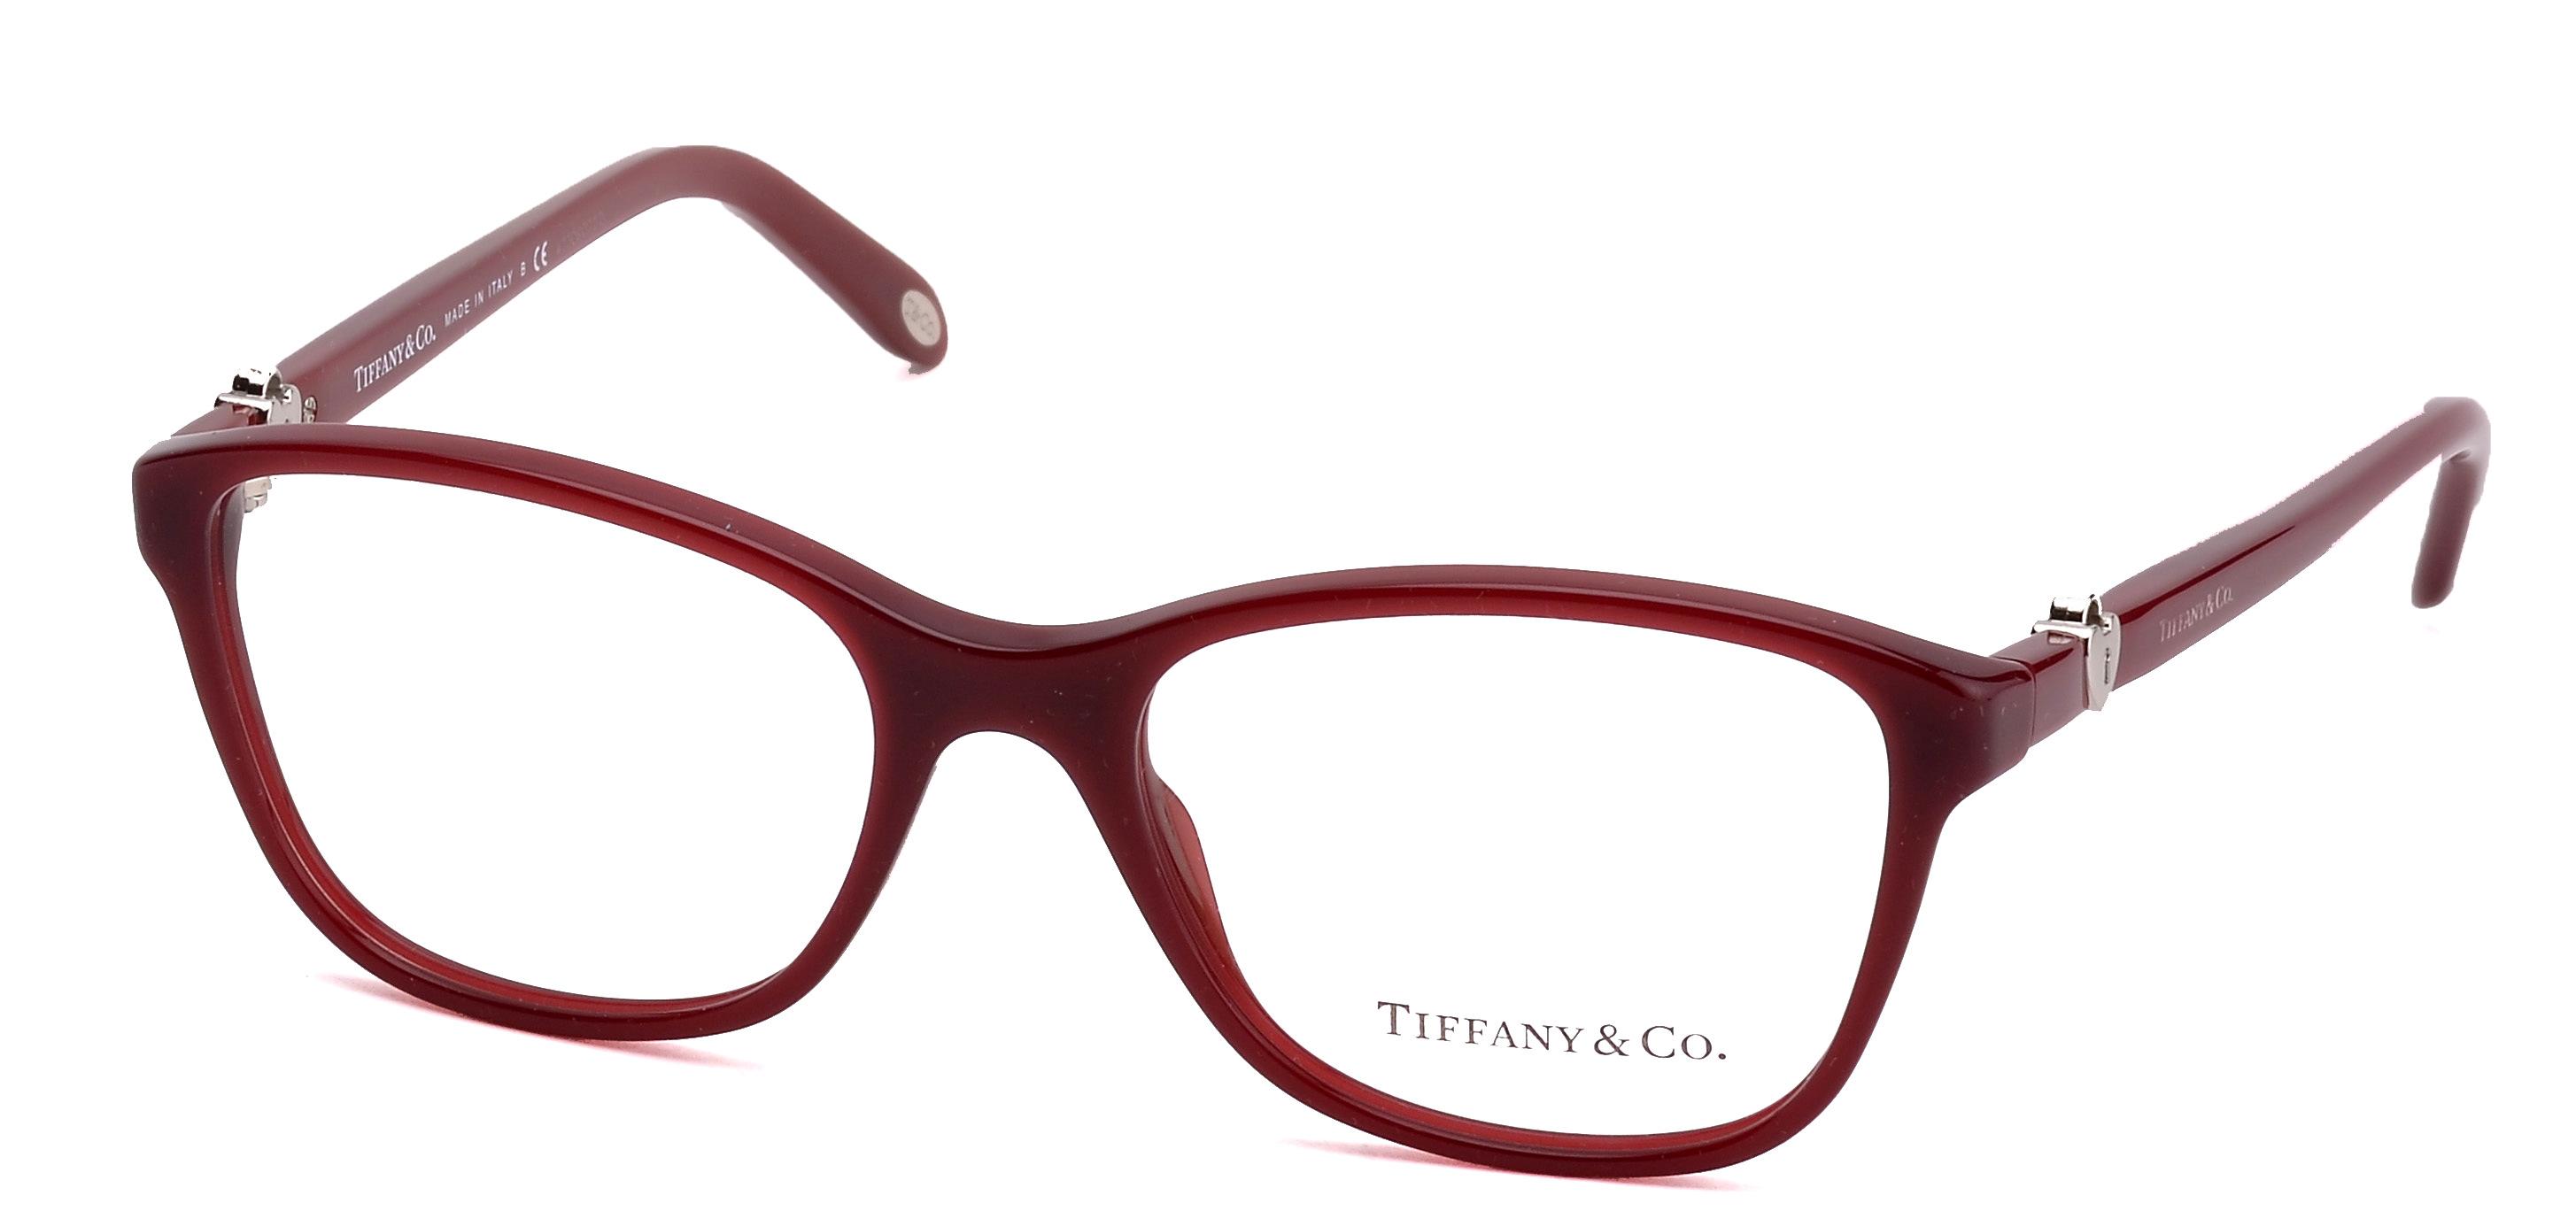 80f7e8dd32 Tiffany CO Women  39 S Eyewear Frames TF 2081 51mm Cyclamen 8152